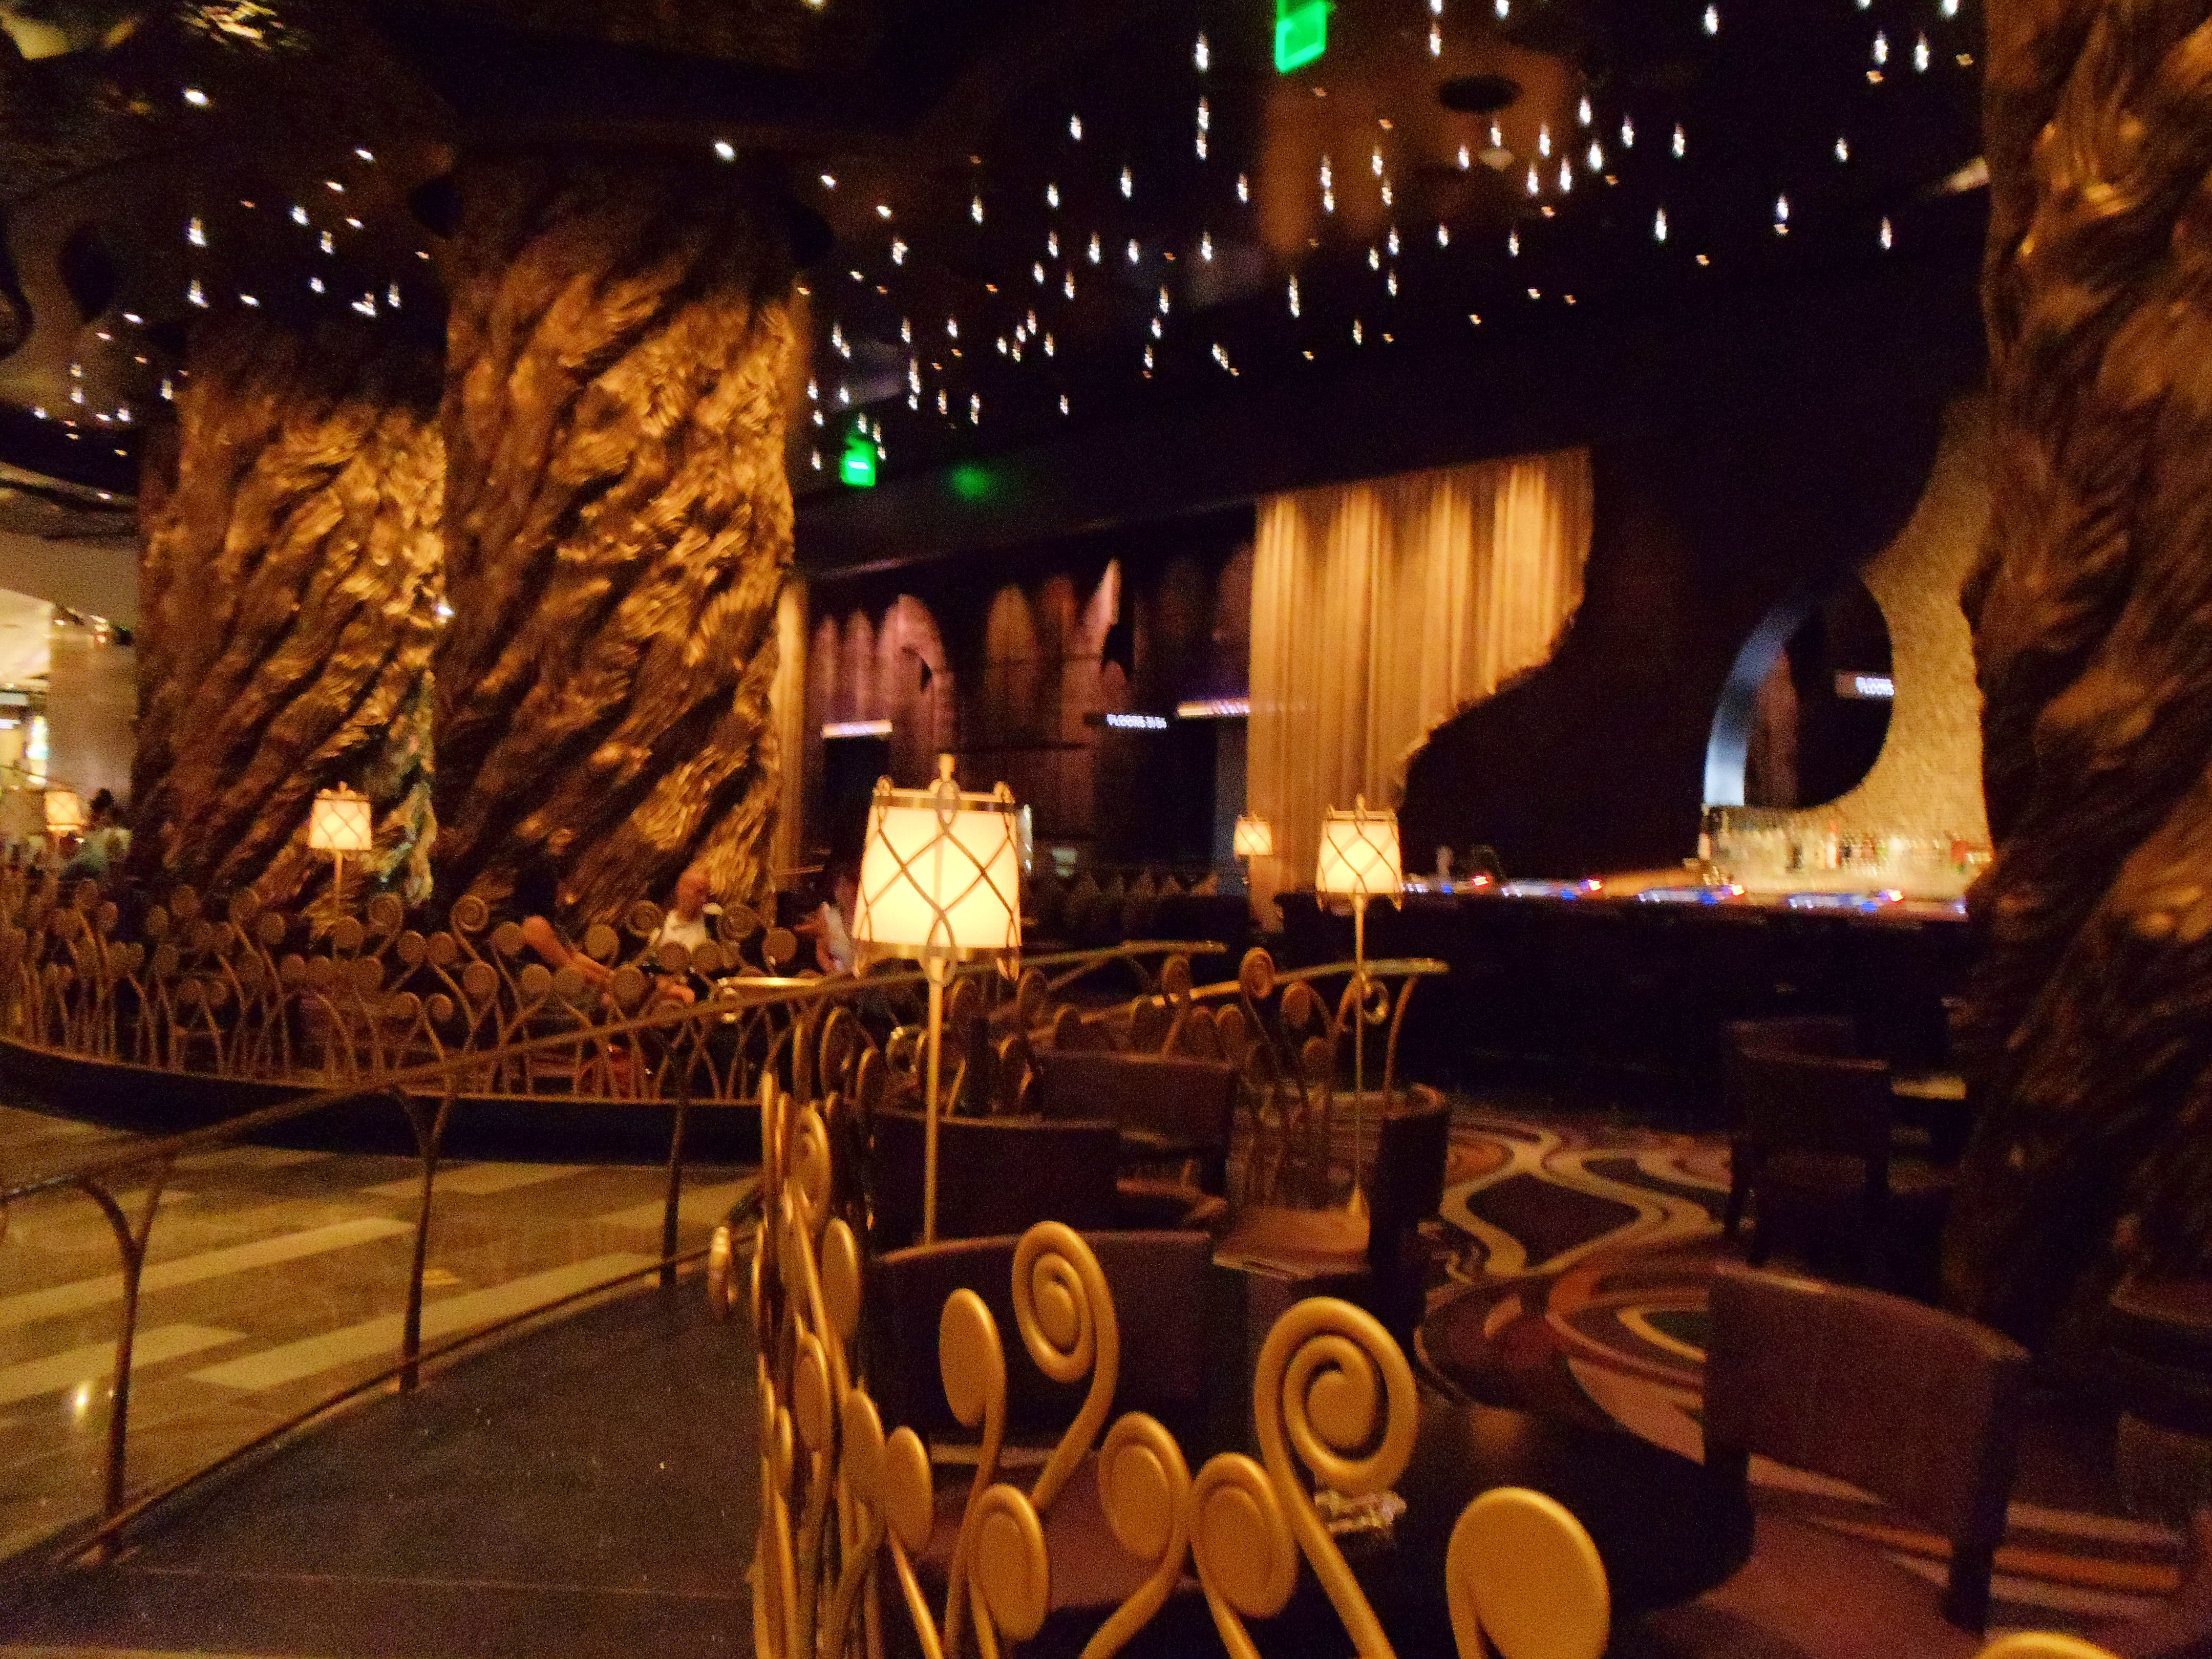 Las Vegas Bars With Good Food